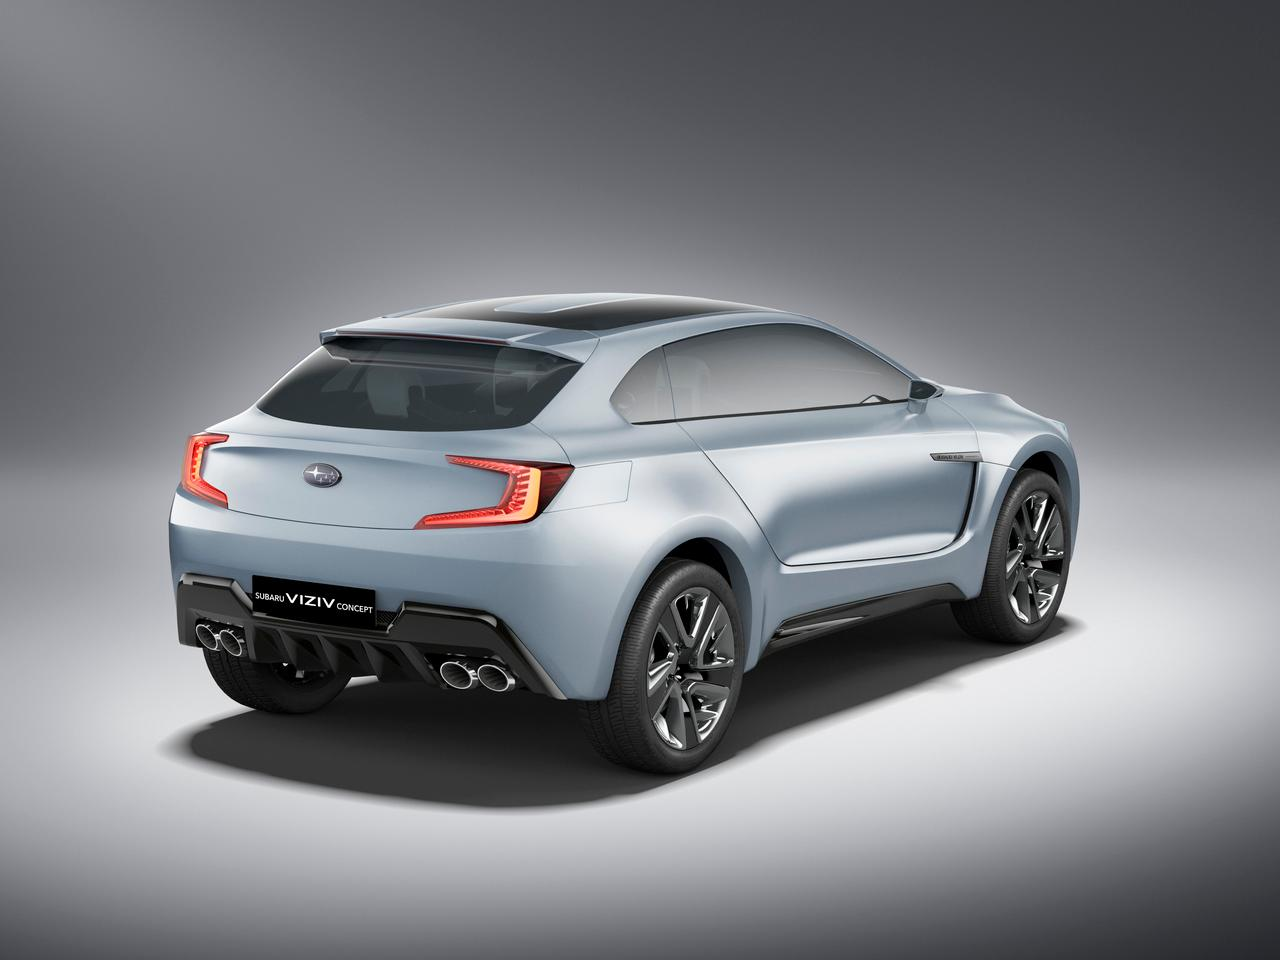 Subaru Viziv Concept exterior rear